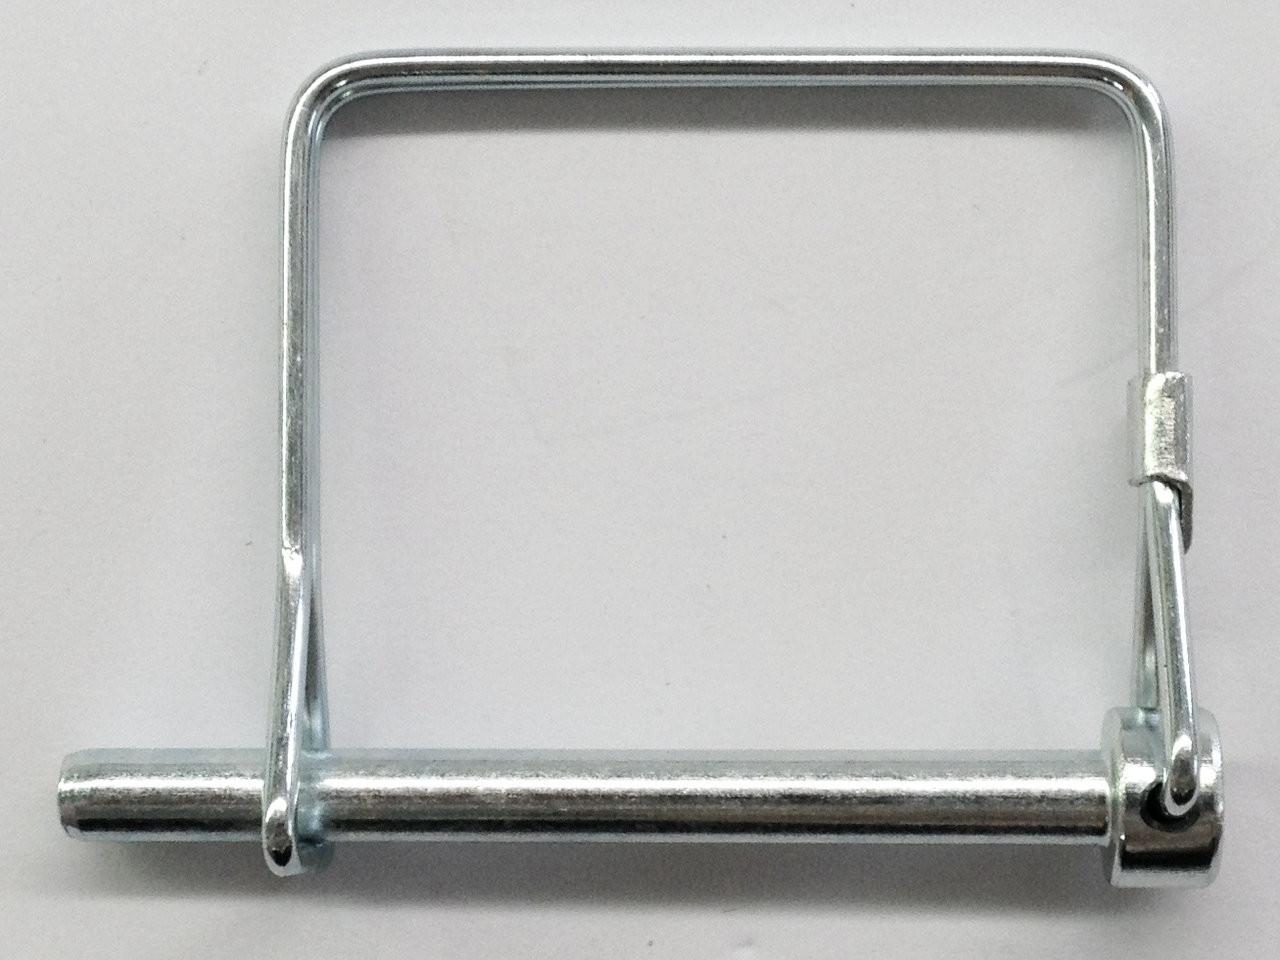 Coupler Safety Pin Tie Down Engineering : Trailer coupler saftey locking pin